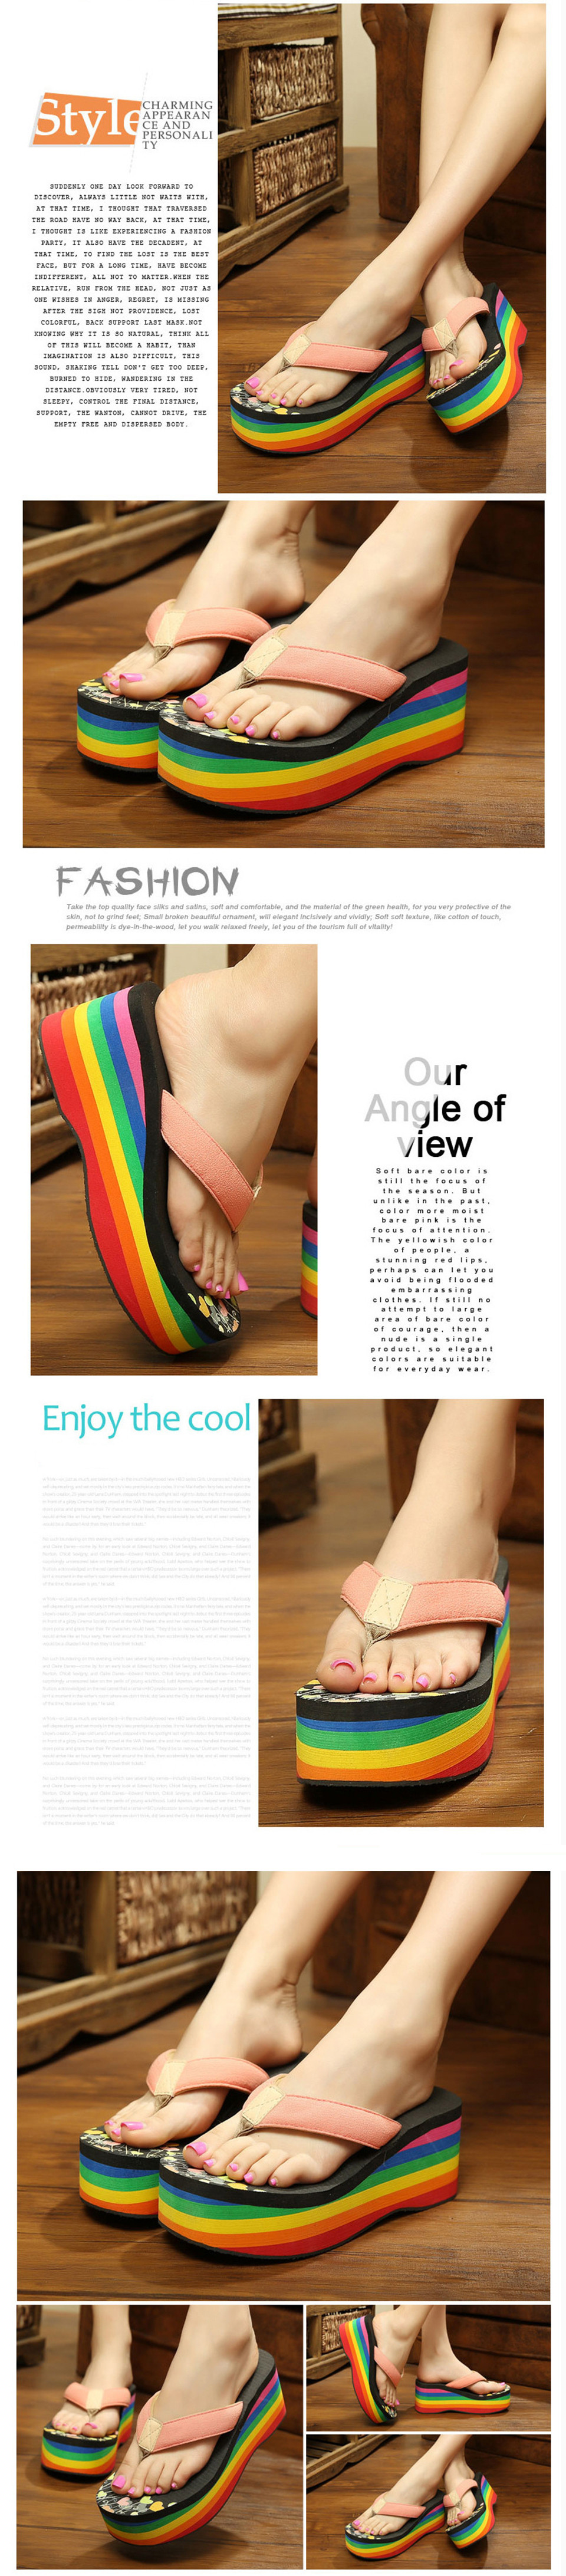 2ae4a7f55c4f Rainbow Striped Platform Wedge Flip Flops Casual High Heels Sandals Women  Summer Sandale Femme Shoes EVA Beach Shoes Woman